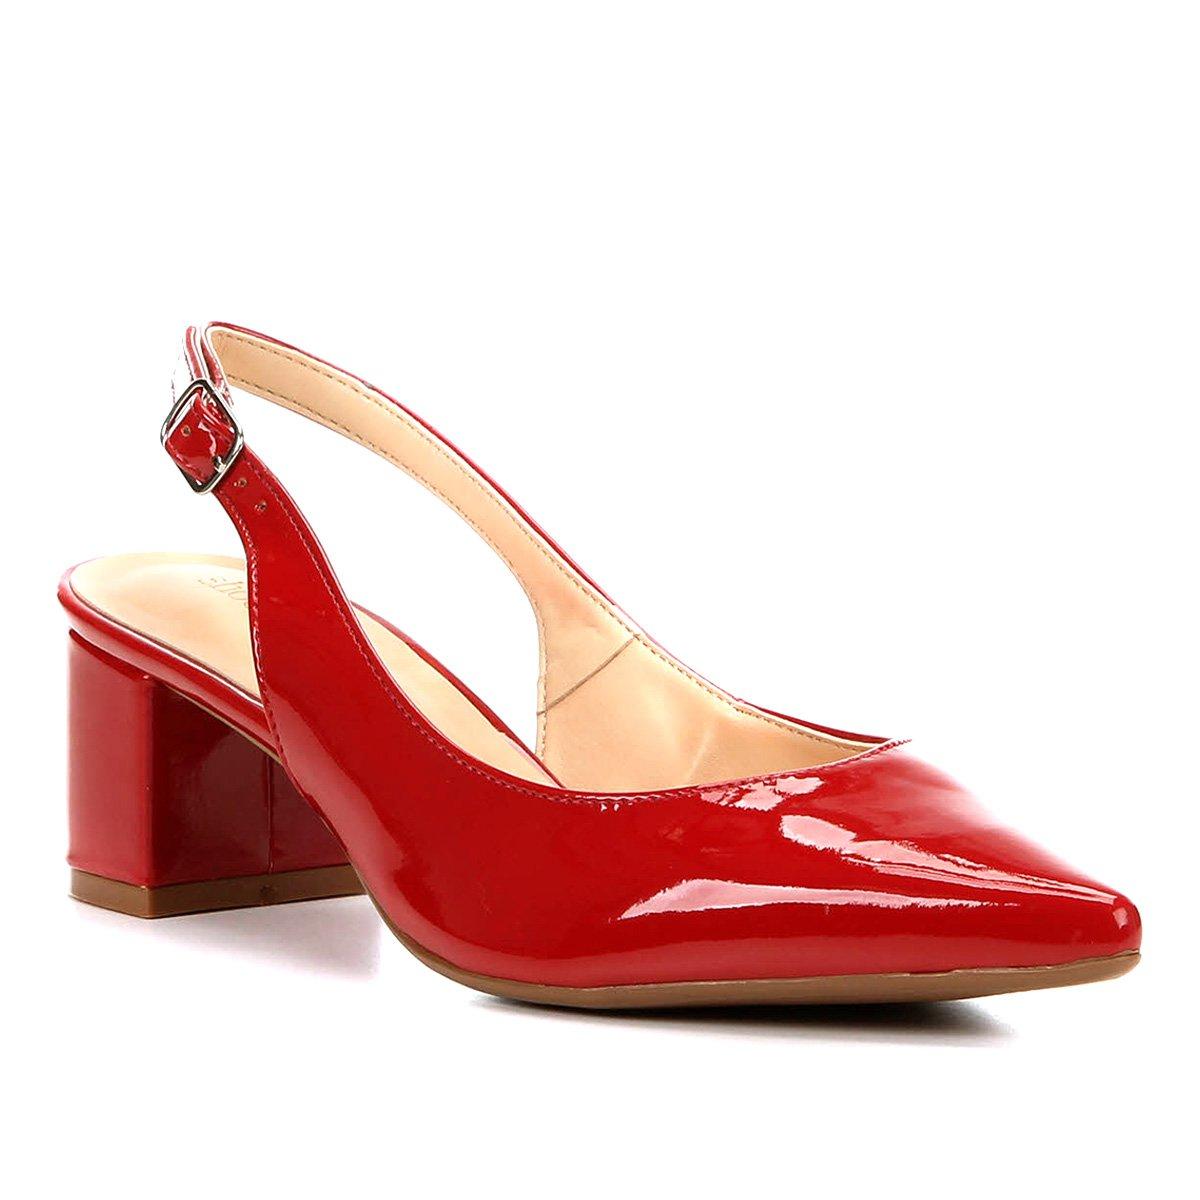 ba5fe8008b Scarpin Shoestock Salto Baixo Verniz Bico Fino - Vermelho